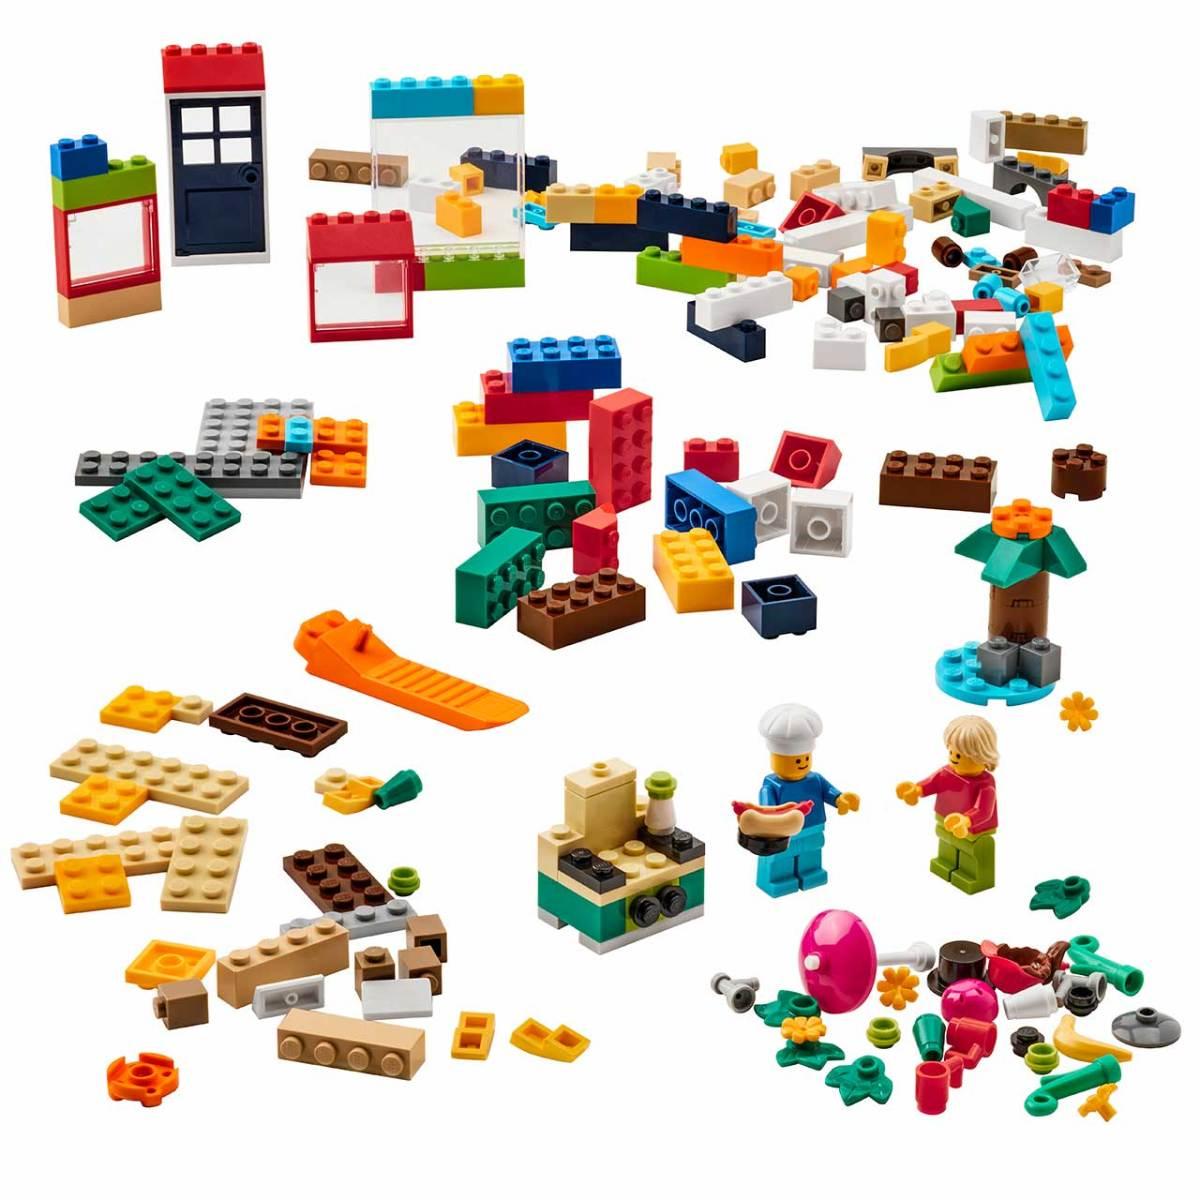 BYGGLEK-IKEA-Lego-storage-boxes-14